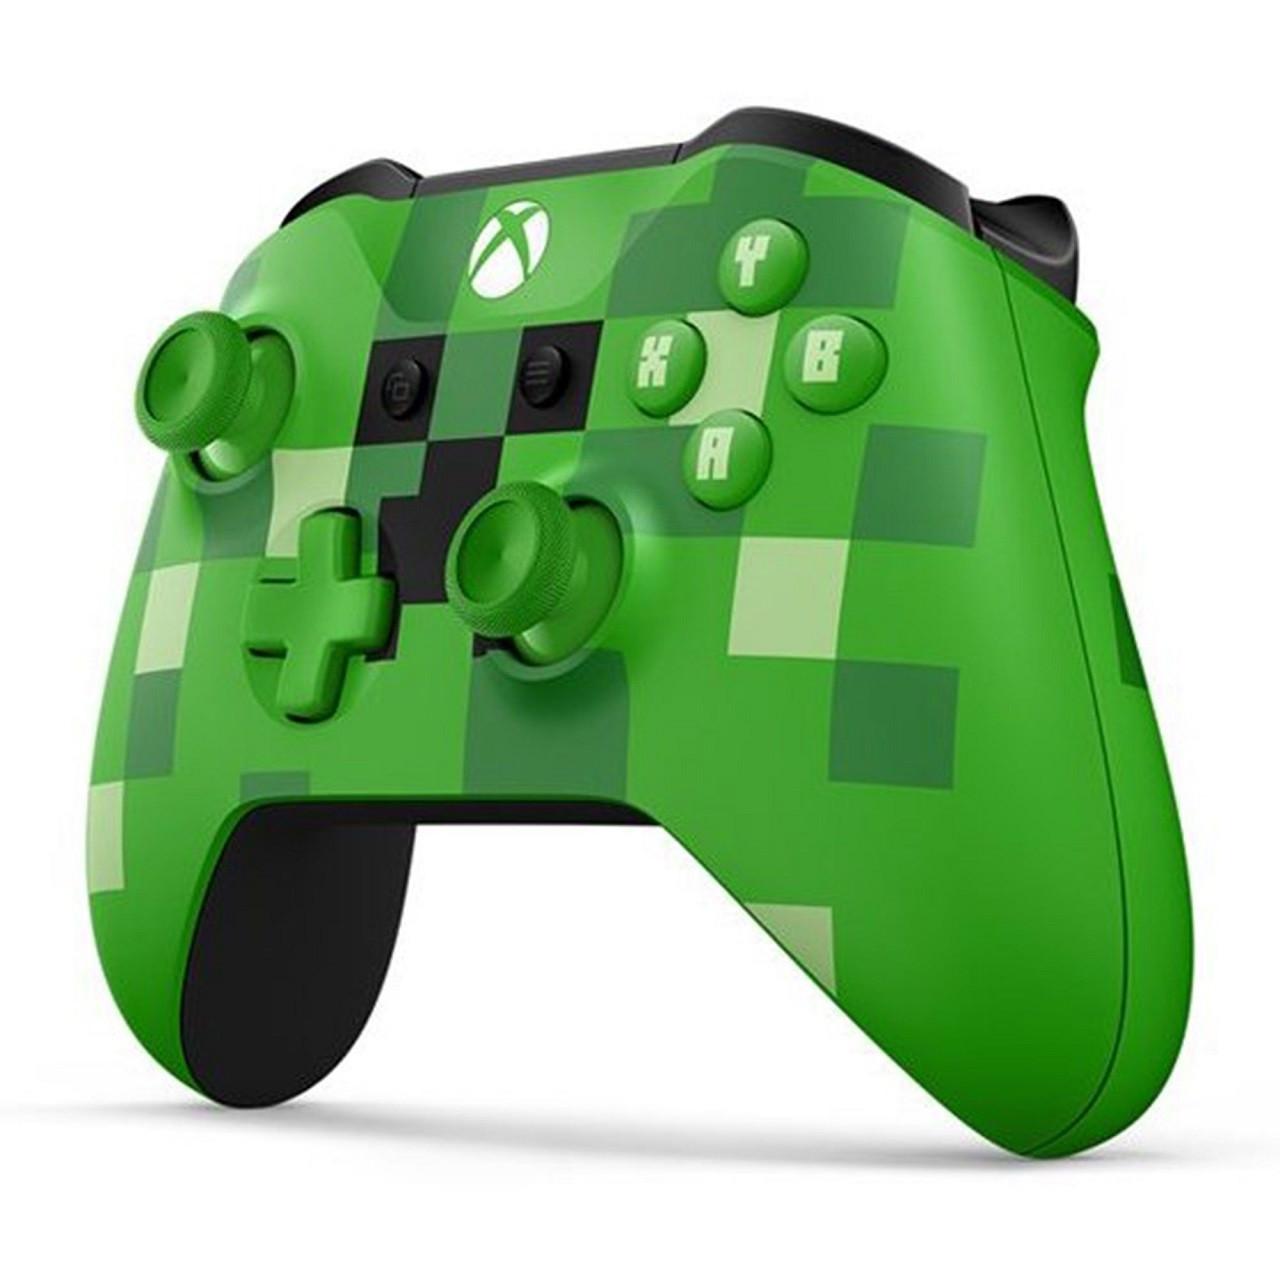 Microsoft Xbox ONE S Wireless Controller Minecraft Creeper Геймпад Безпровідний Маніпулятор